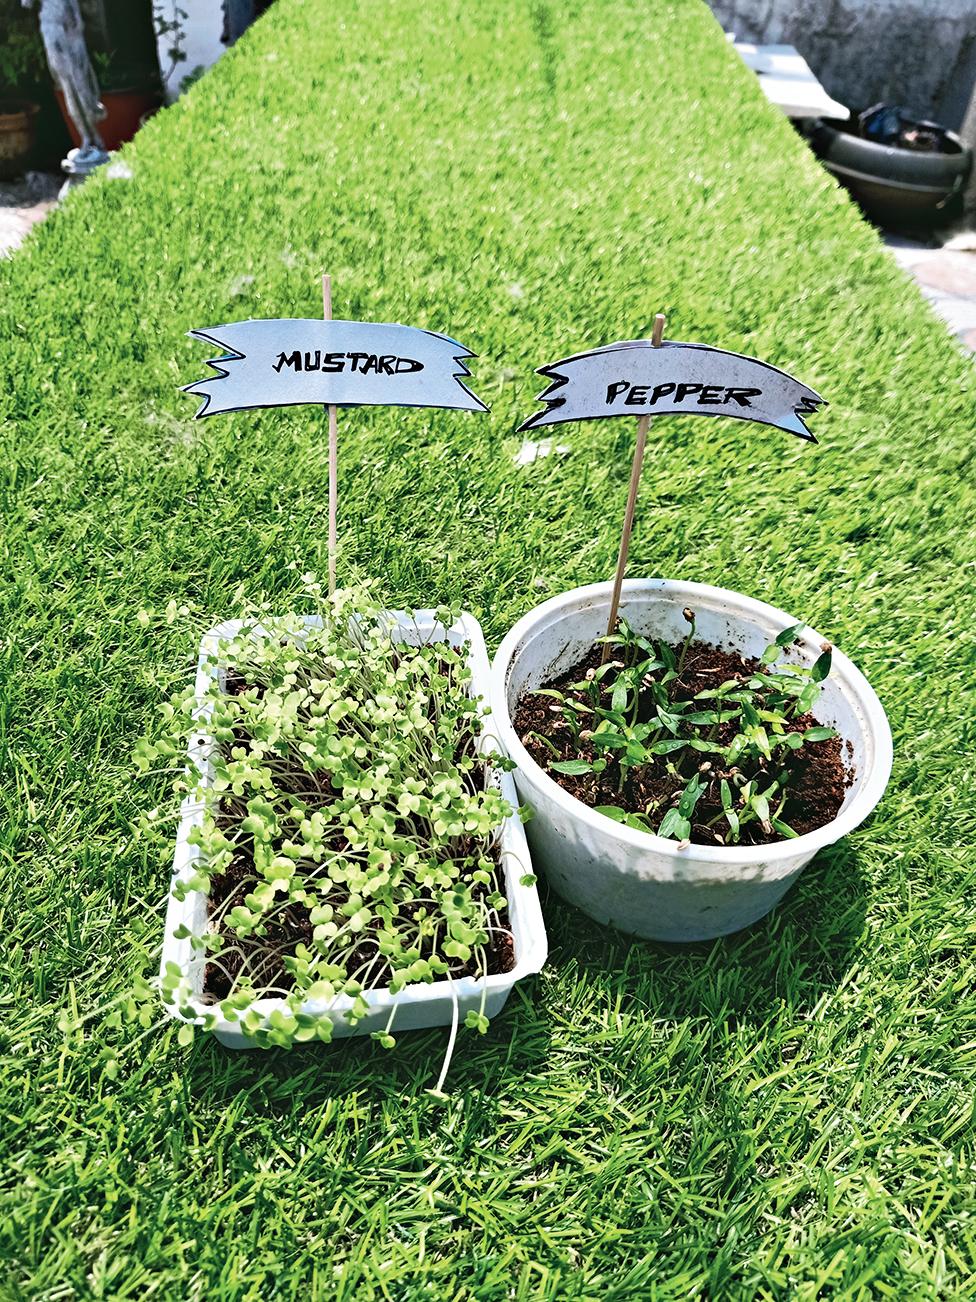 Snapshots from Abhishek's DIY lockdown diary: Grow your own microgreens and herbs